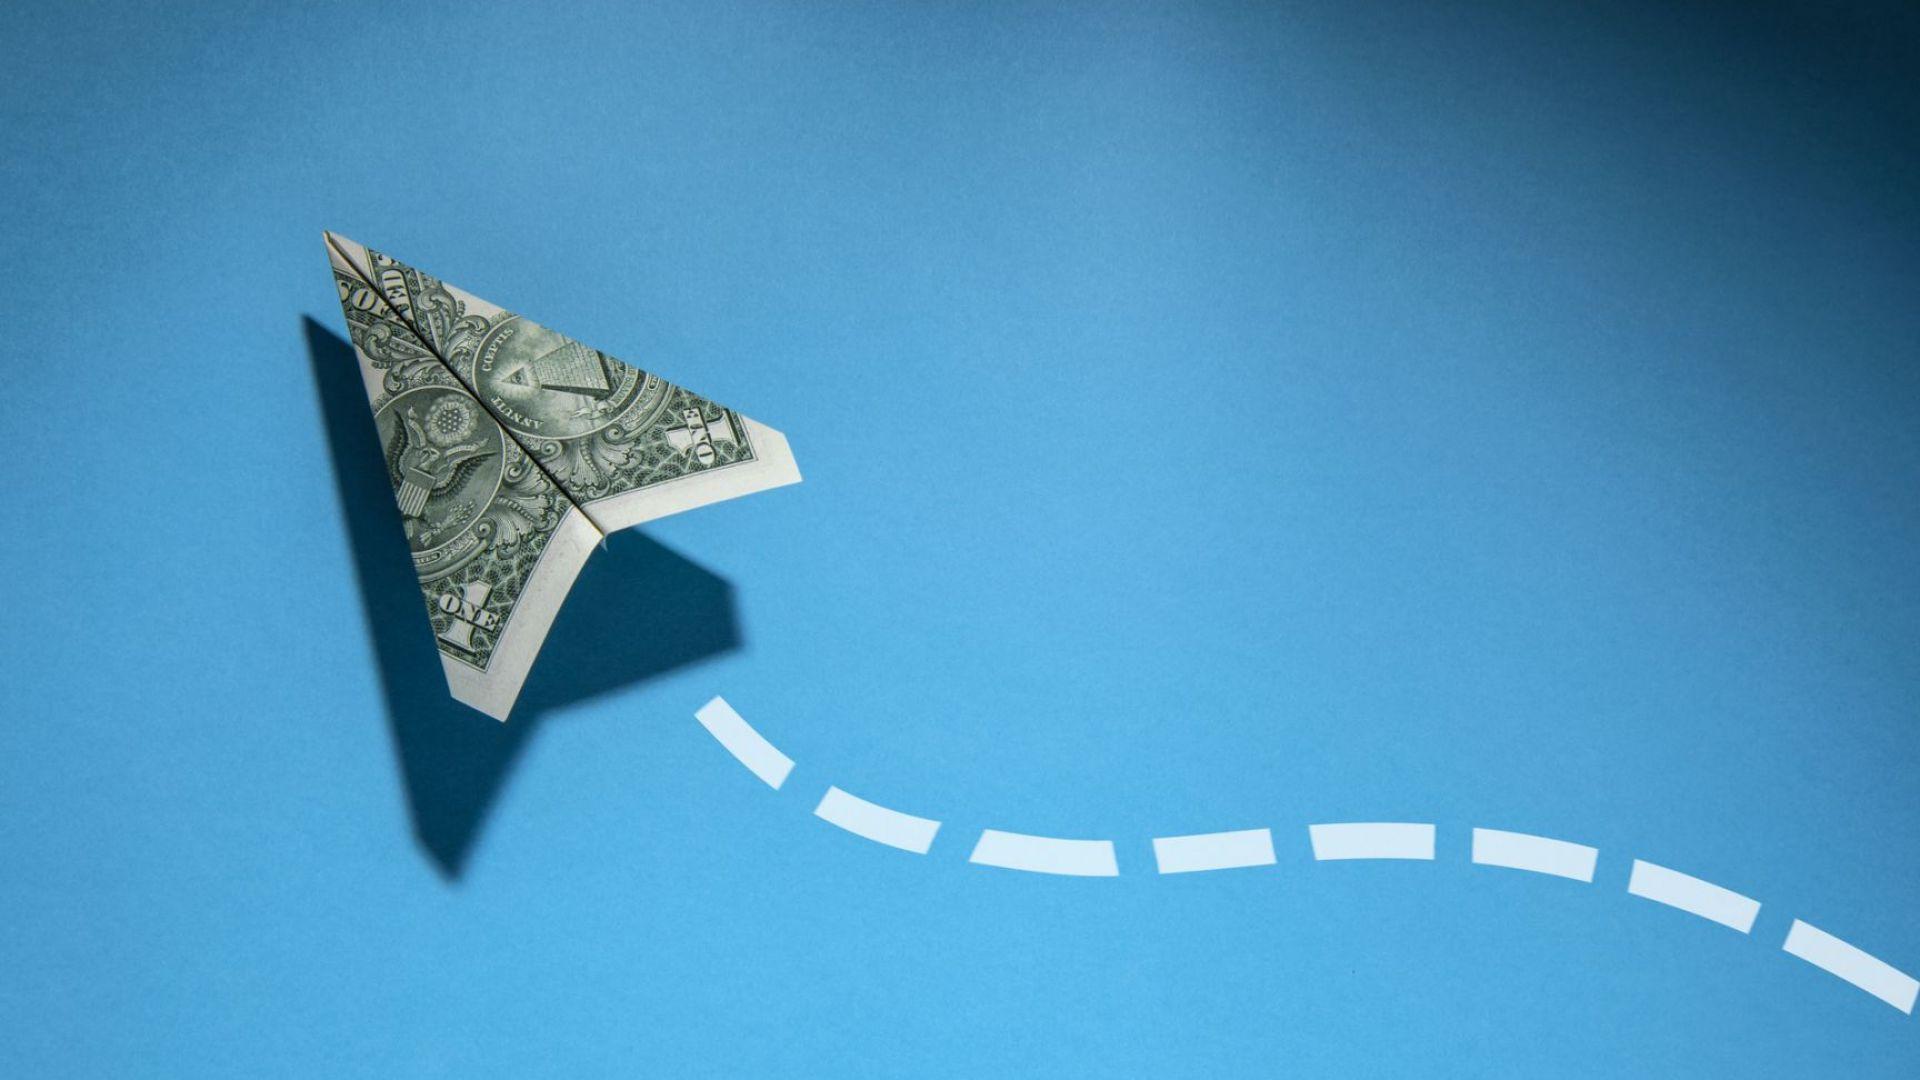 Фондът на фондовете готви нови инстурумени за микрокредитиране